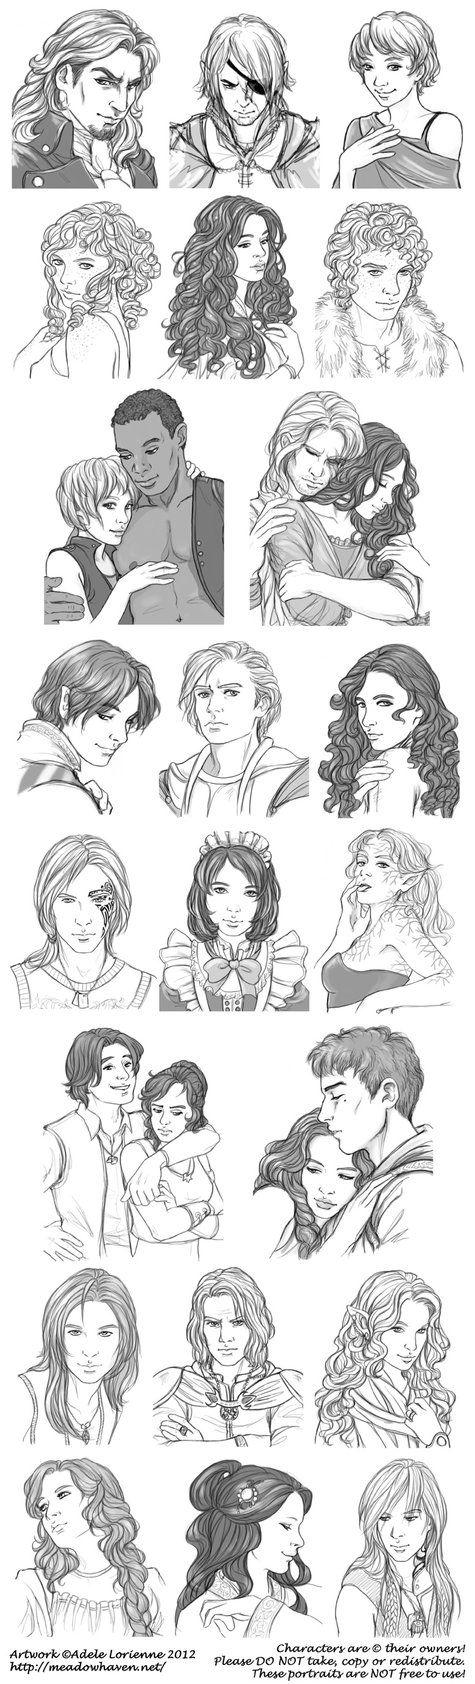 Digital Sketch Commissions -Round Four by Saimain.deviantart.com on @DeviantArt